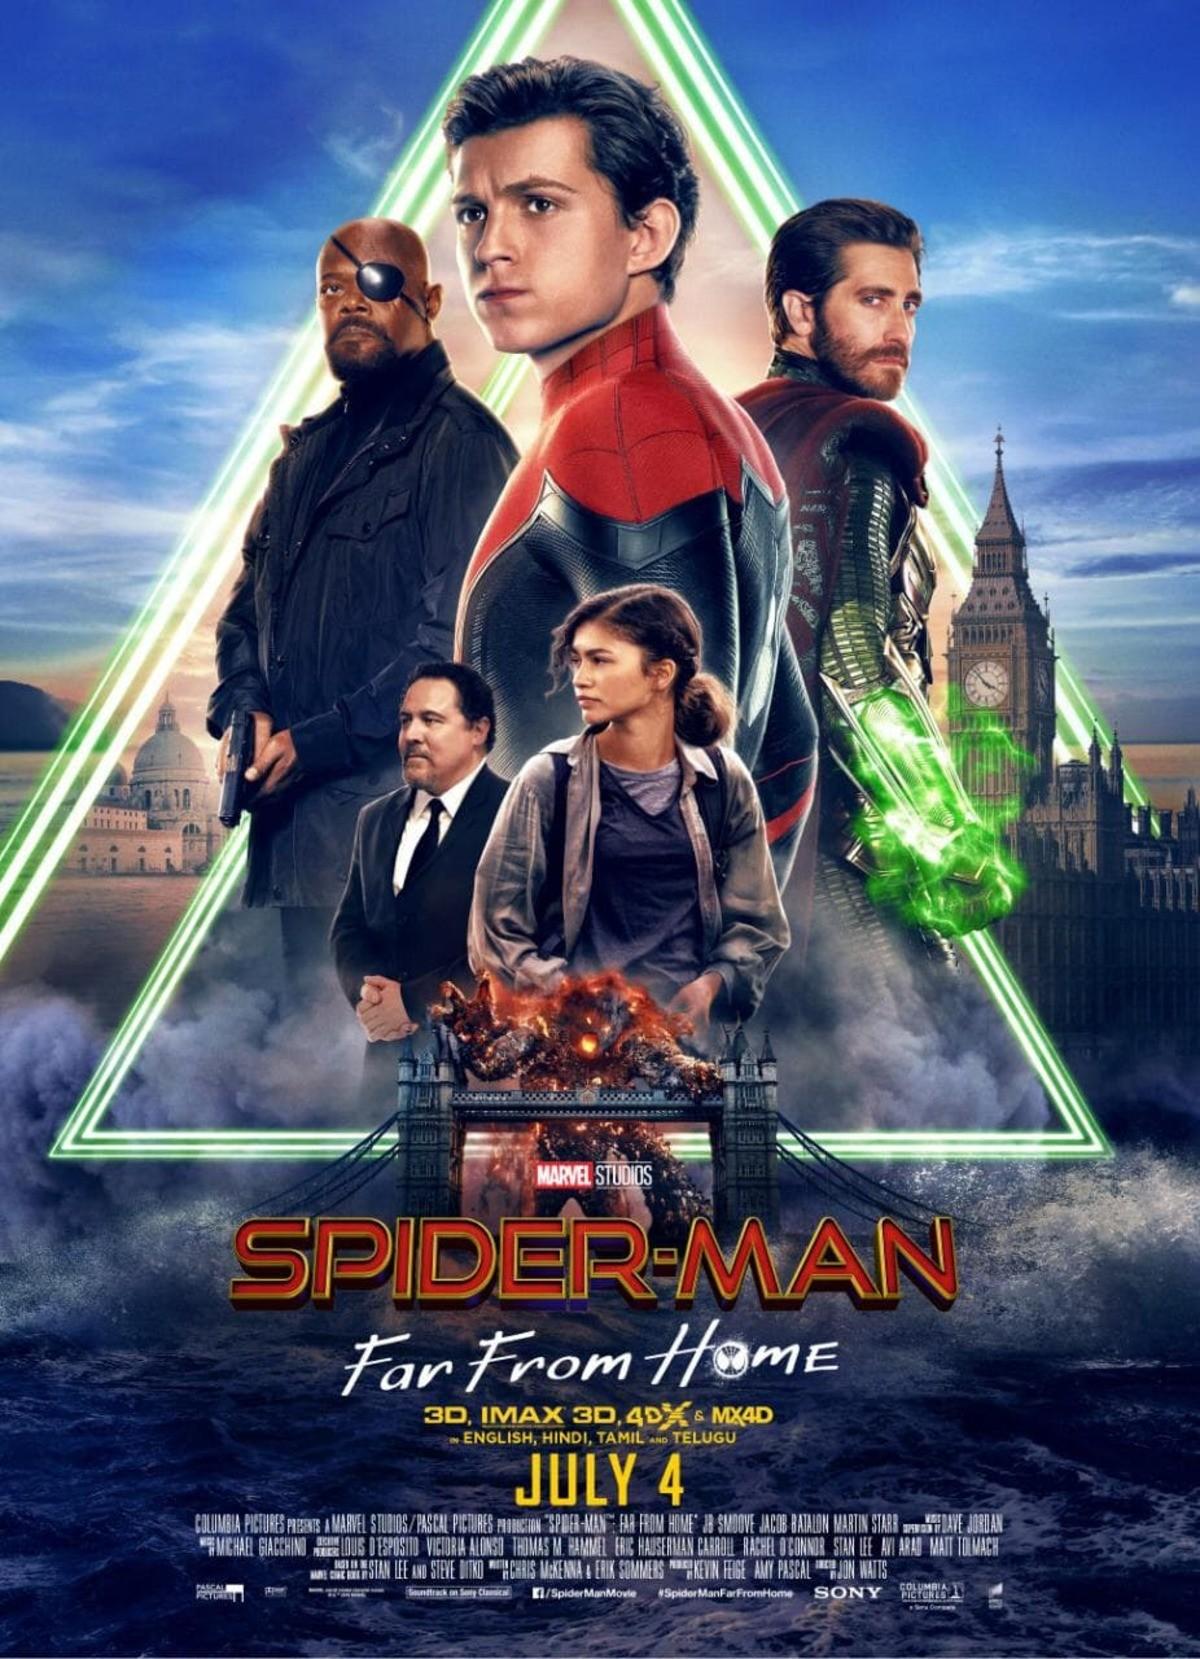 Spider Man Far From Home 2019 Brrip Original Telugu Hindi Tamil Eng Dubbed Full Movie Watch Online Free Moviez Mixure Watch Movies Online Free Download Movies Online Hollywood Tollywood Bollywood